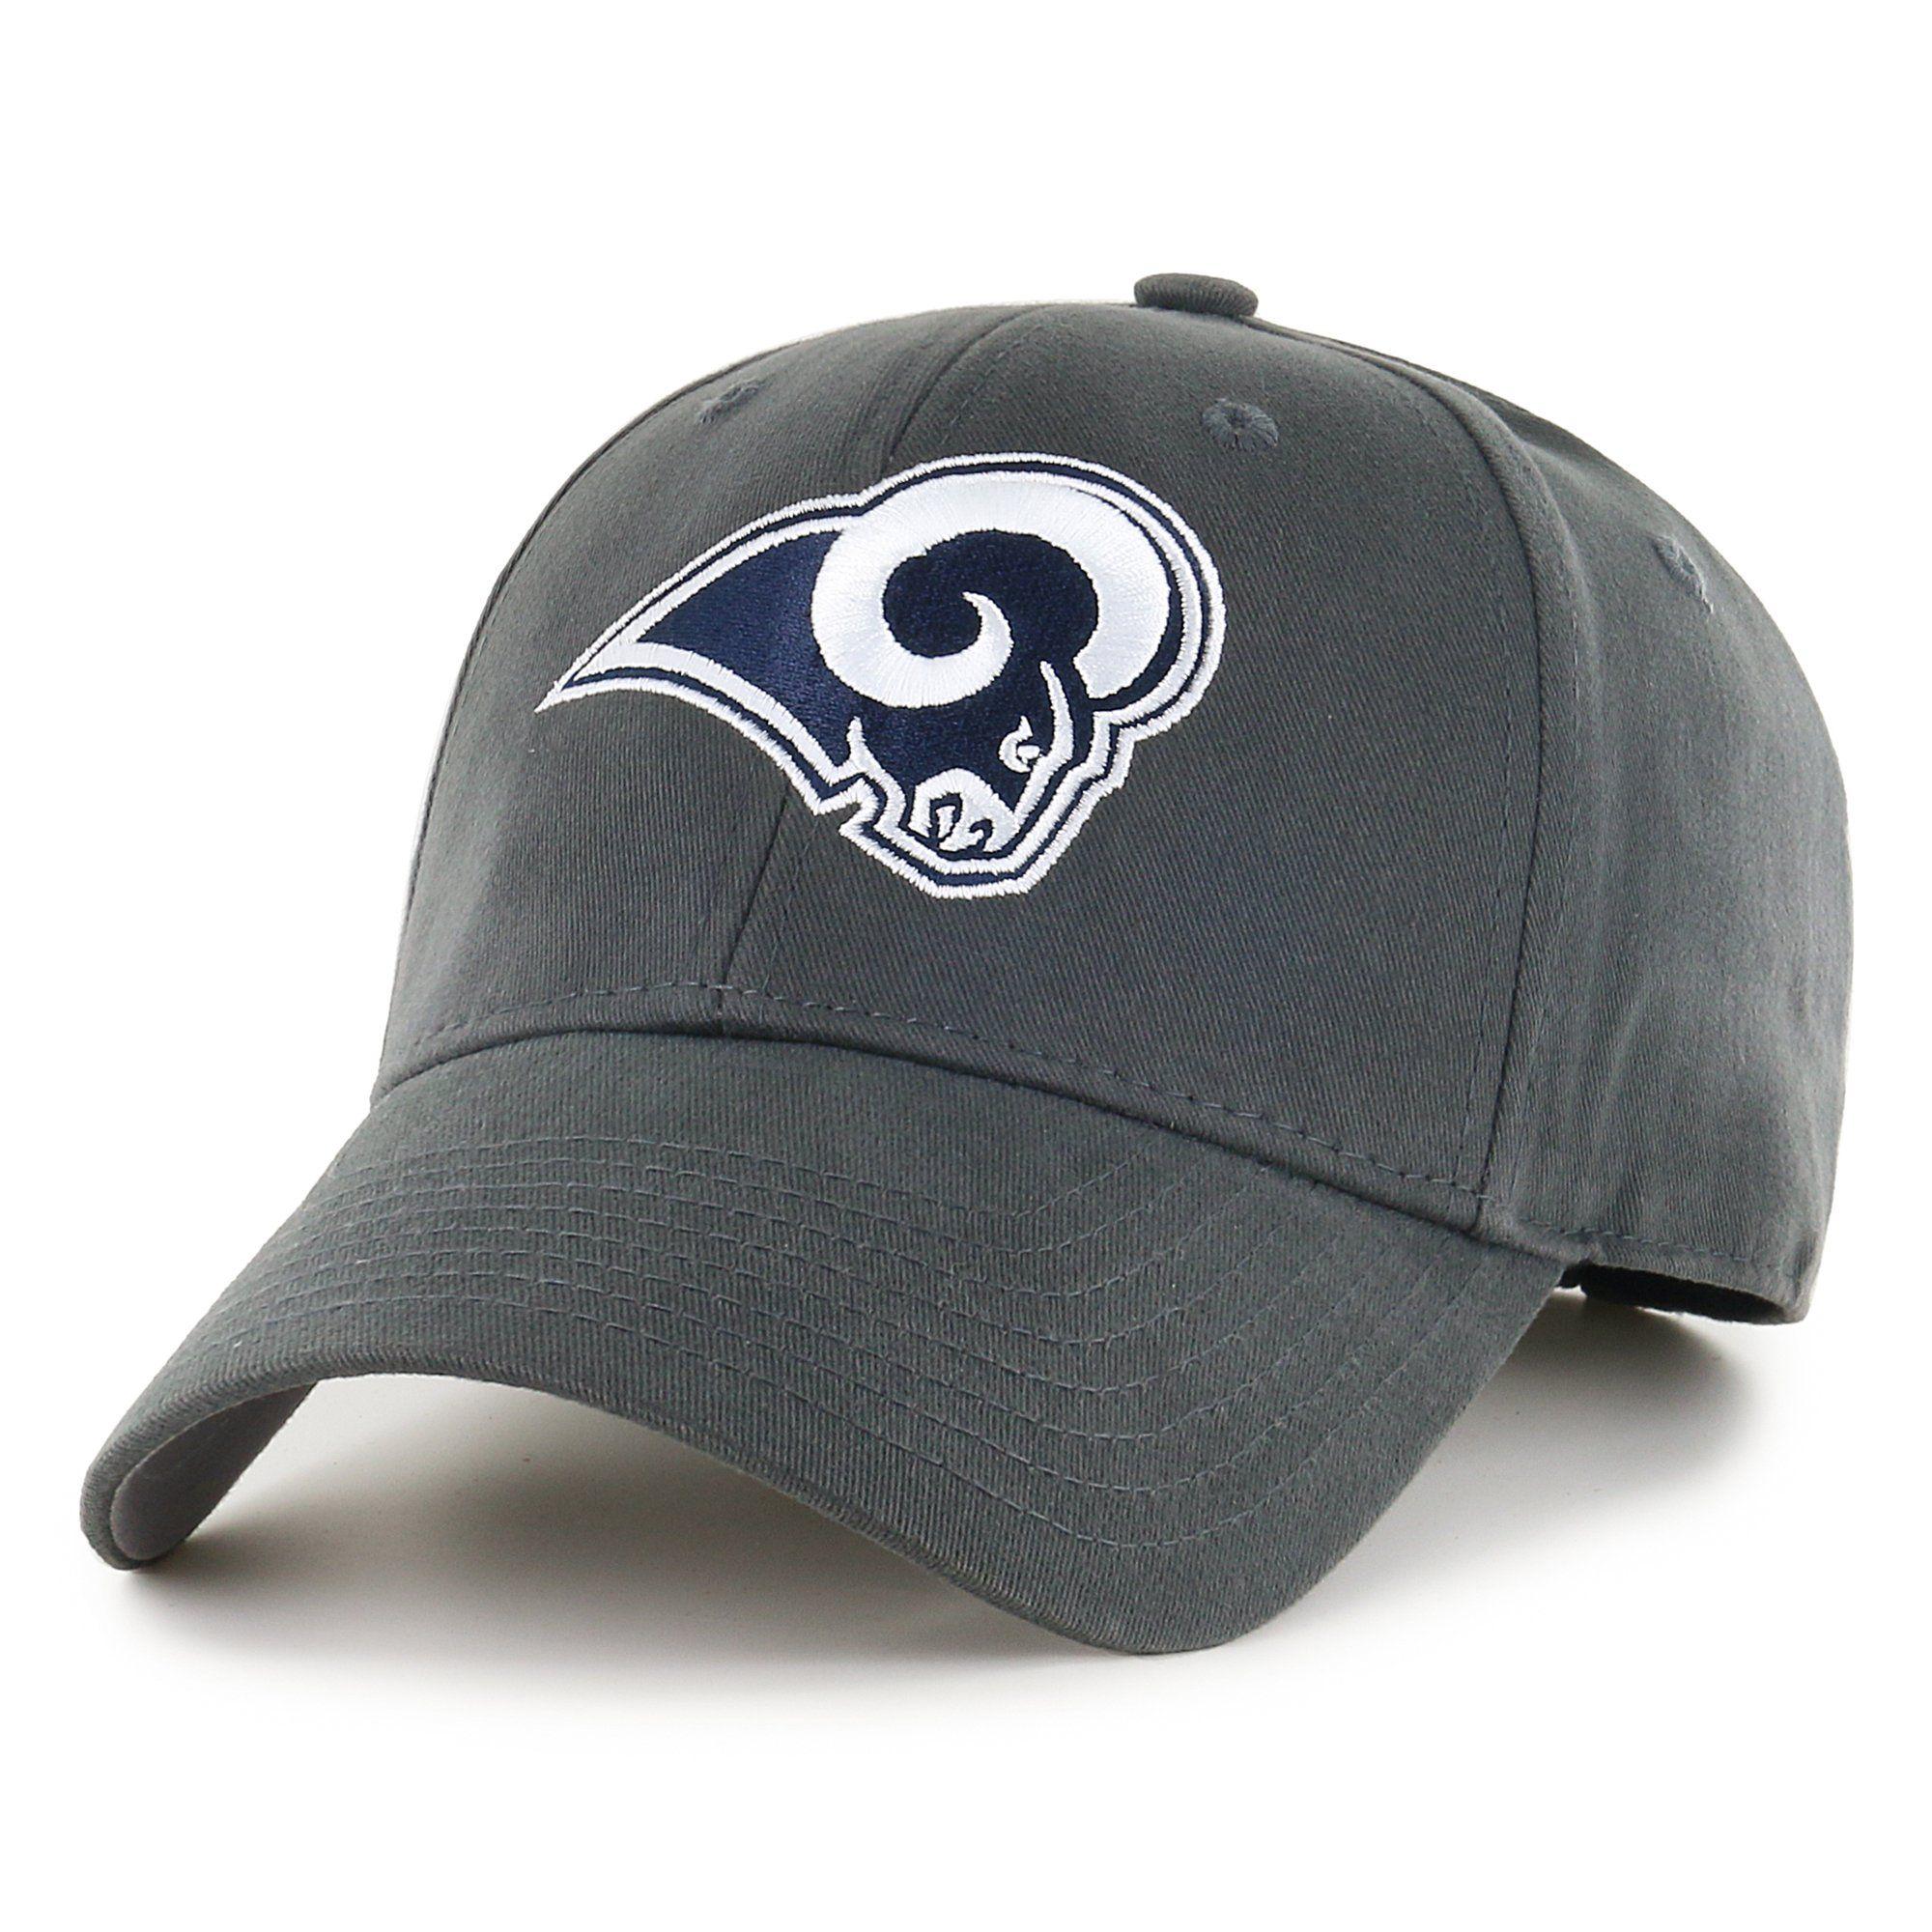 timeless design cbebe 6bbc2 Los Angeles Rams NFL Cap   Hat - Grey